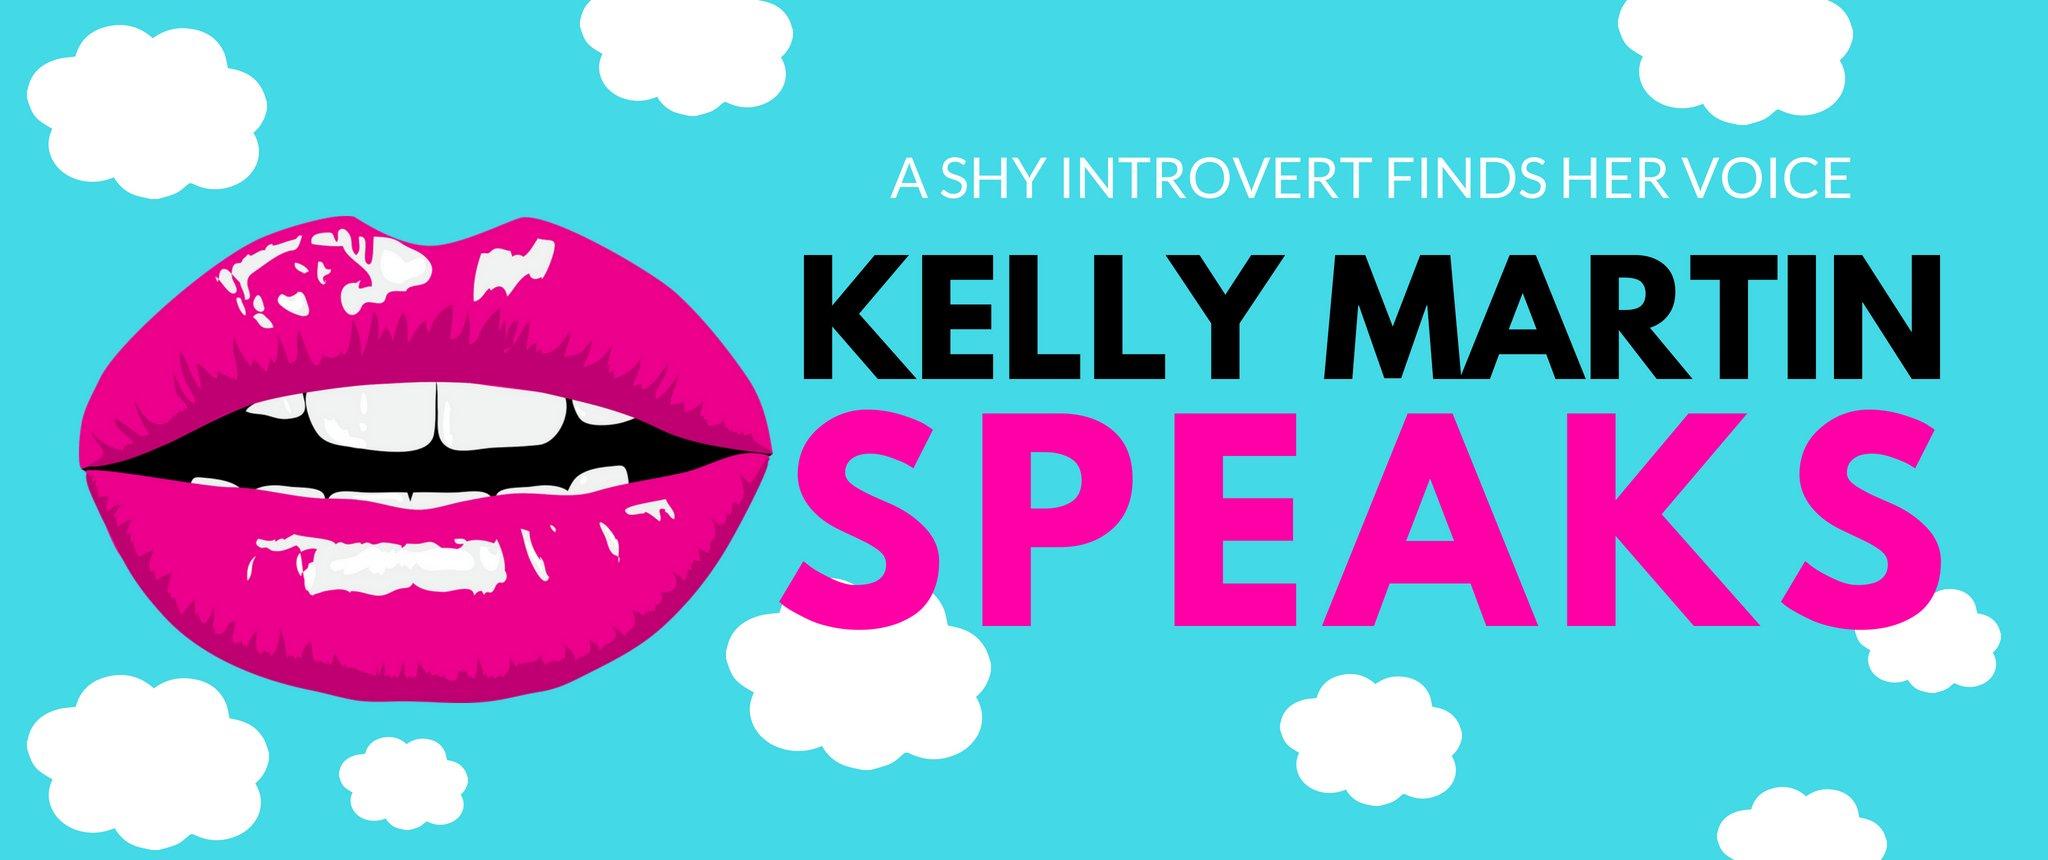 Kelly Martin Speaks